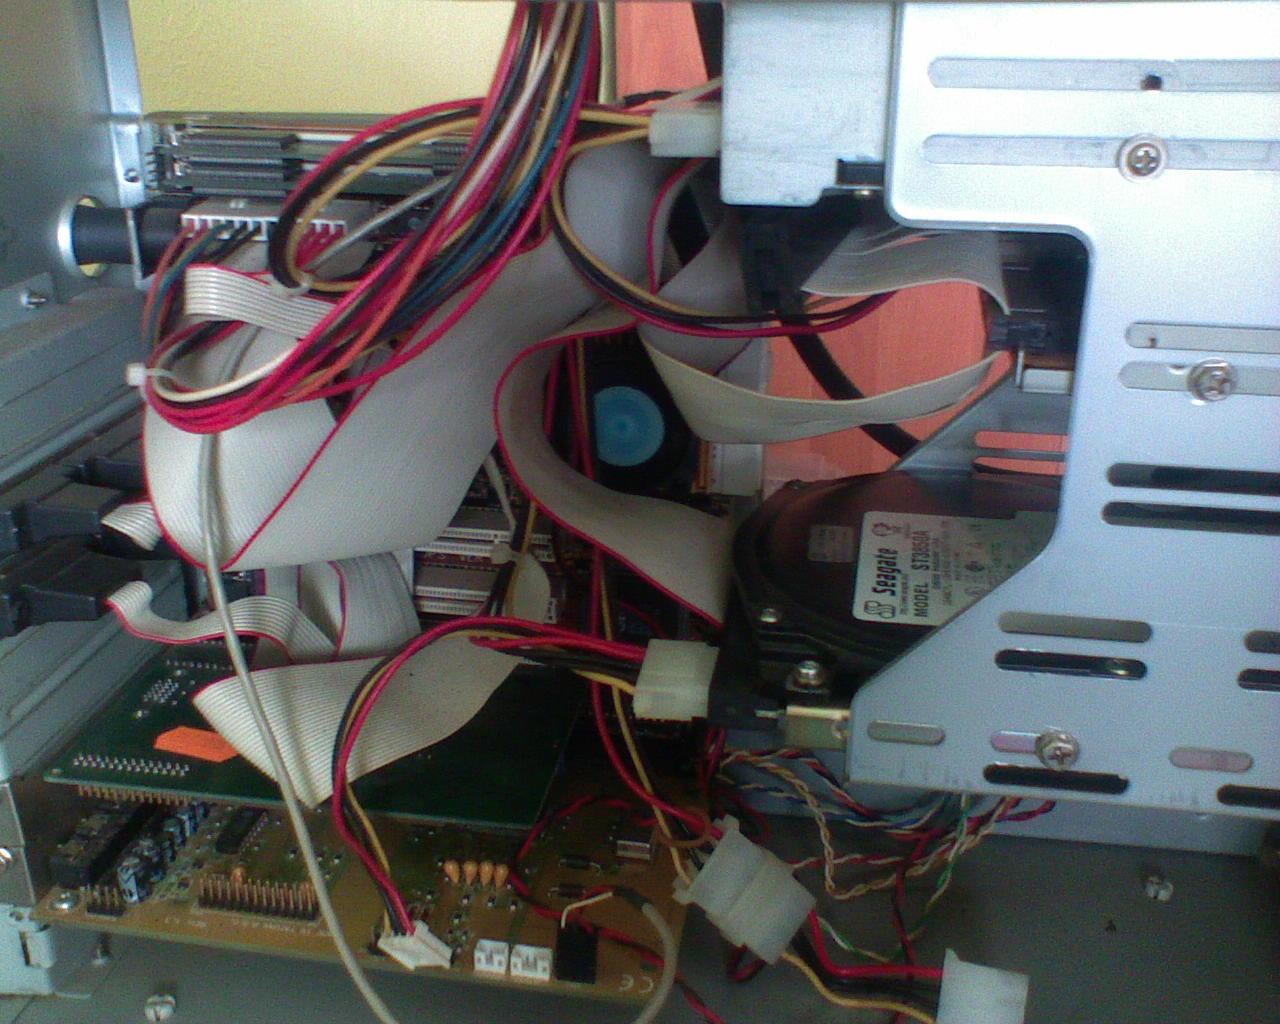 [Inne] Pro�ba o wycen� Zabytkowego Komputera AT Am5x86-P75-S Socket 3.